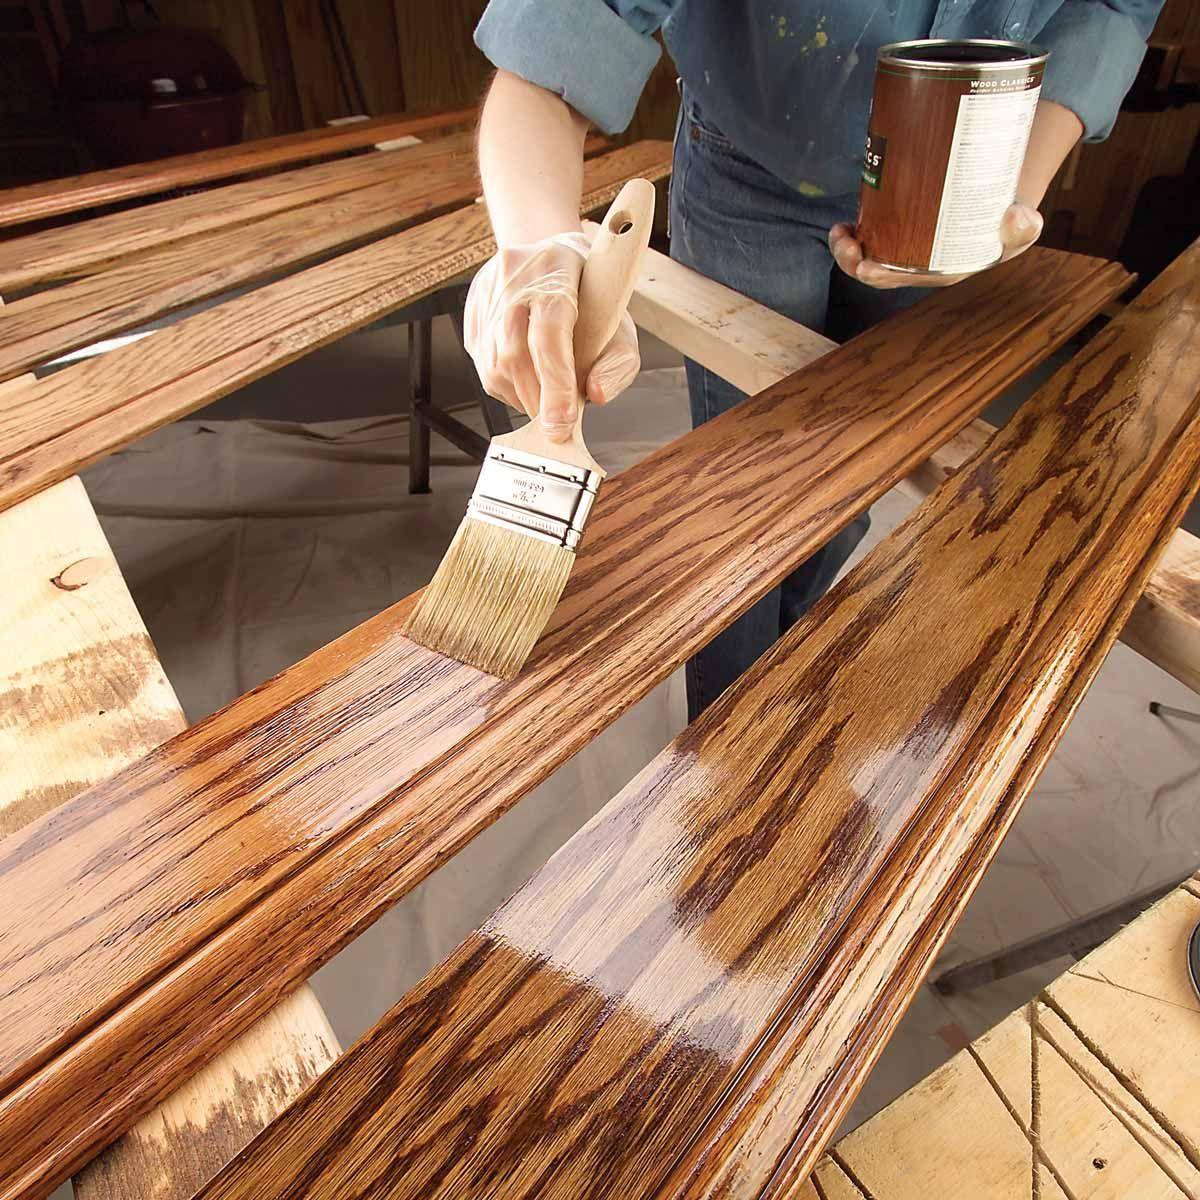 11 Tips on How to Finish Wood Trim | Proyectos de madera, Muebles de ...